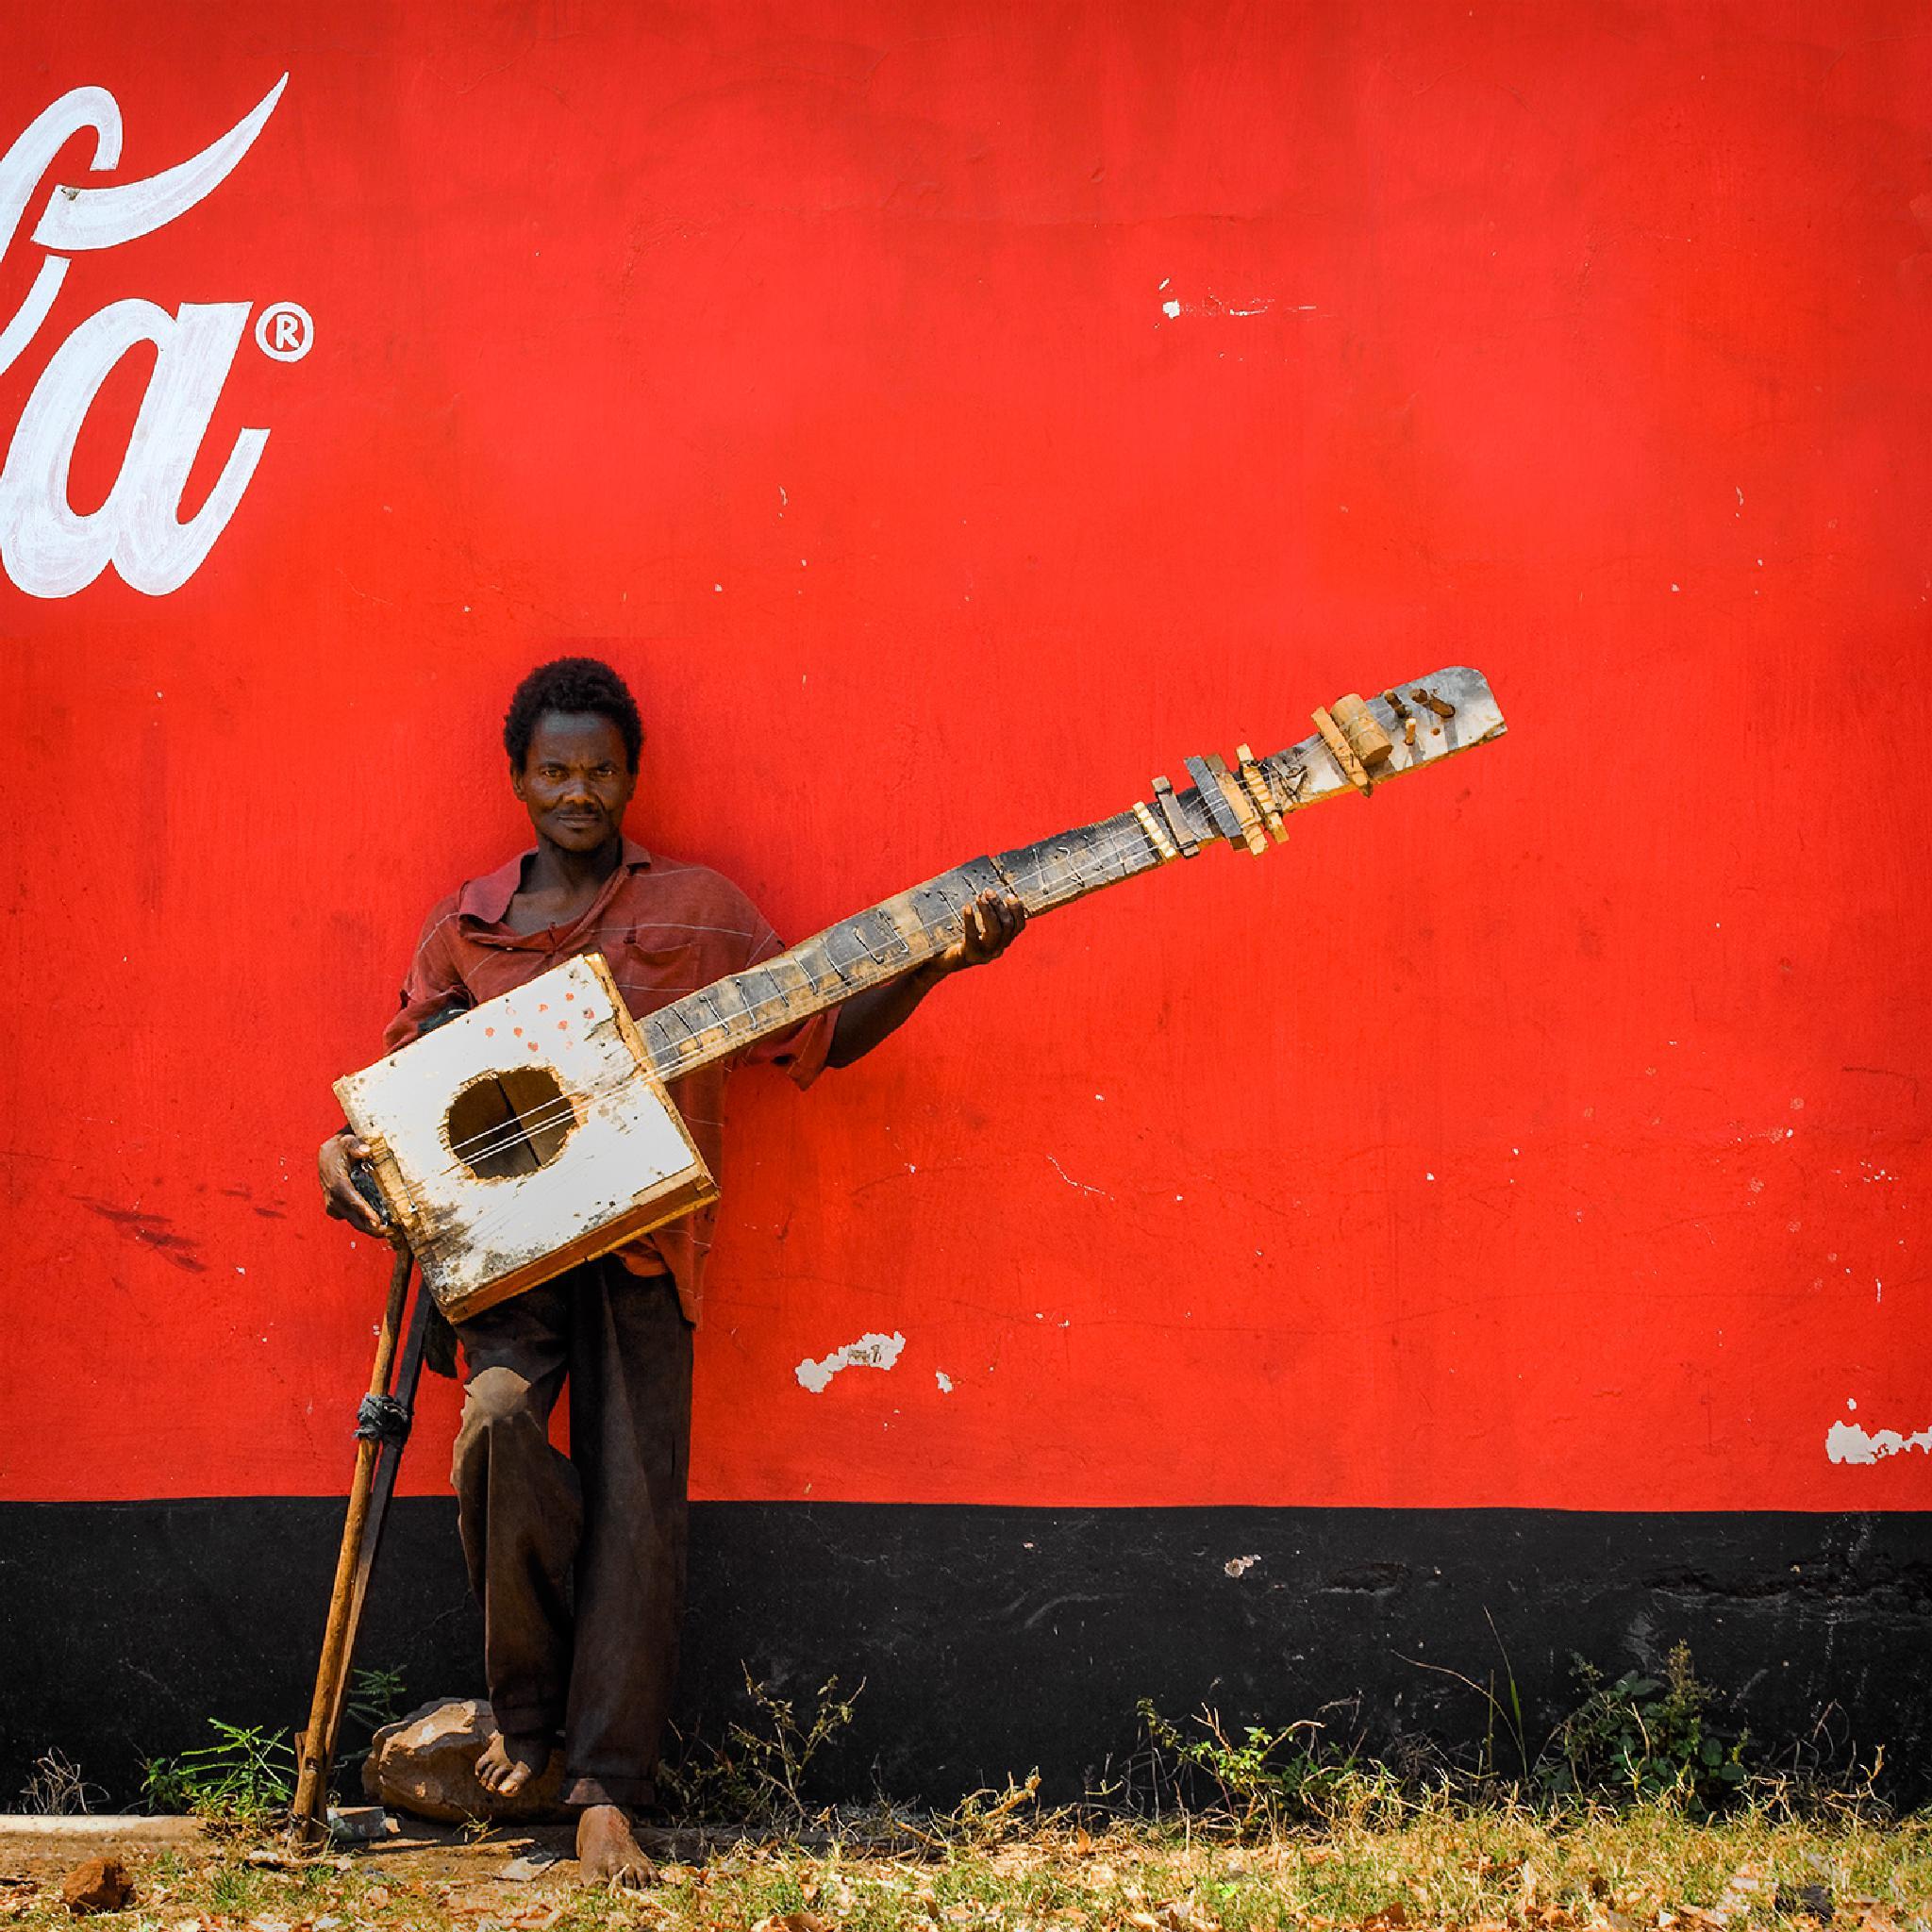 Guitarman by Ed Peeters Photography